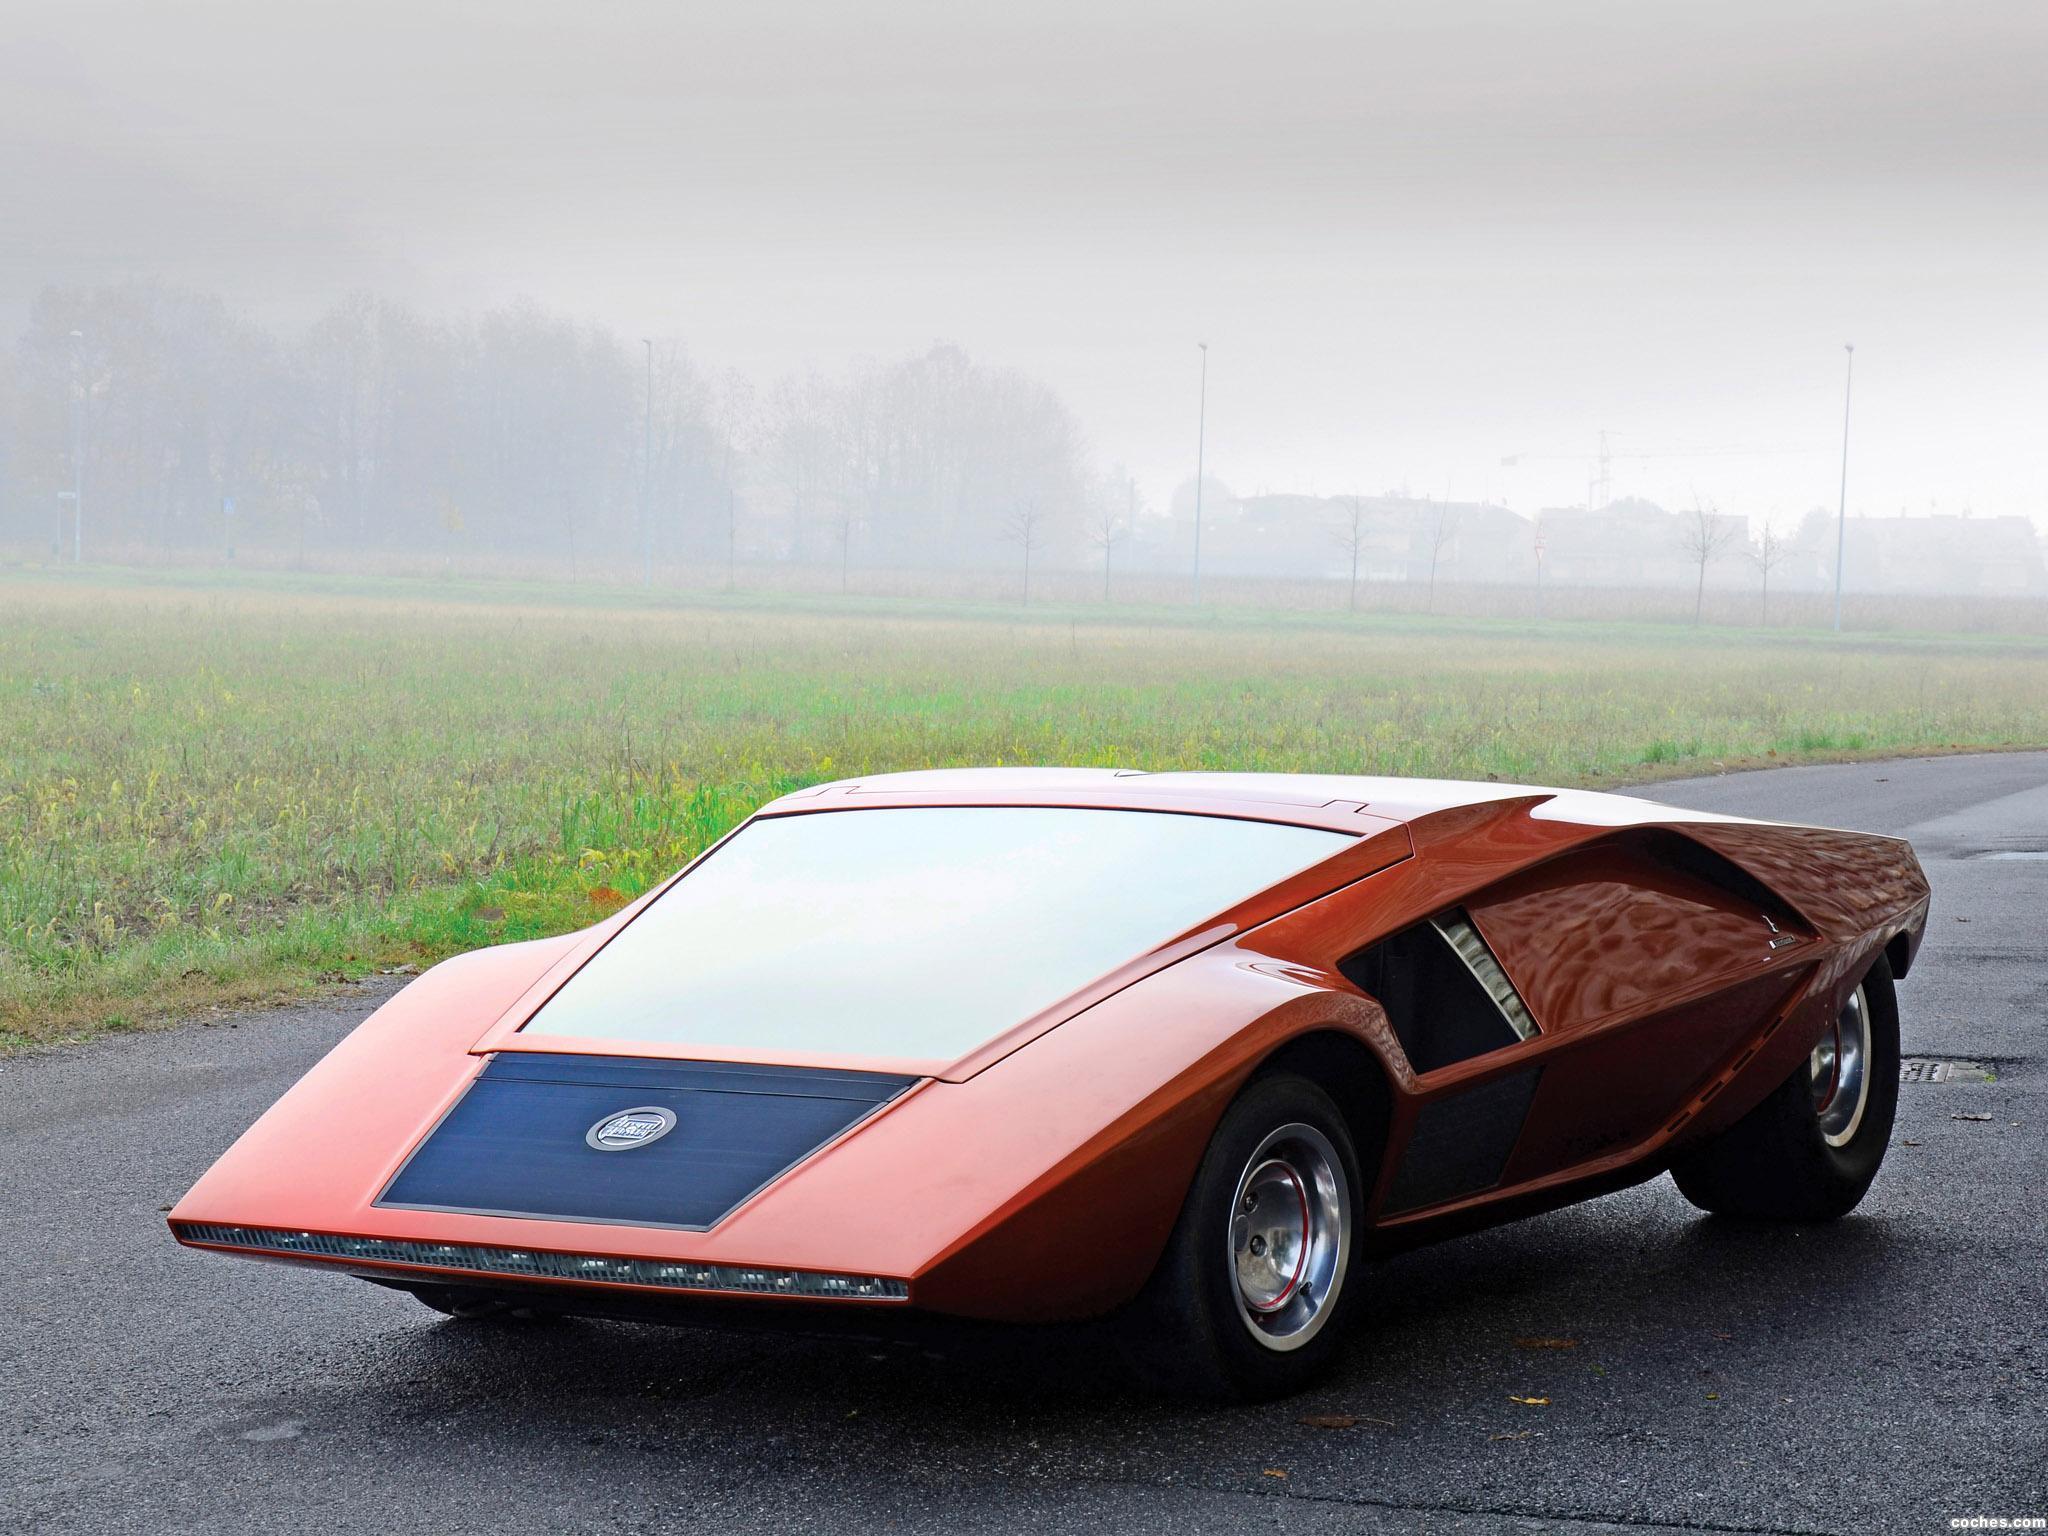 Foto 0 de Bertone Lancia Stratos Zero Concept 1970